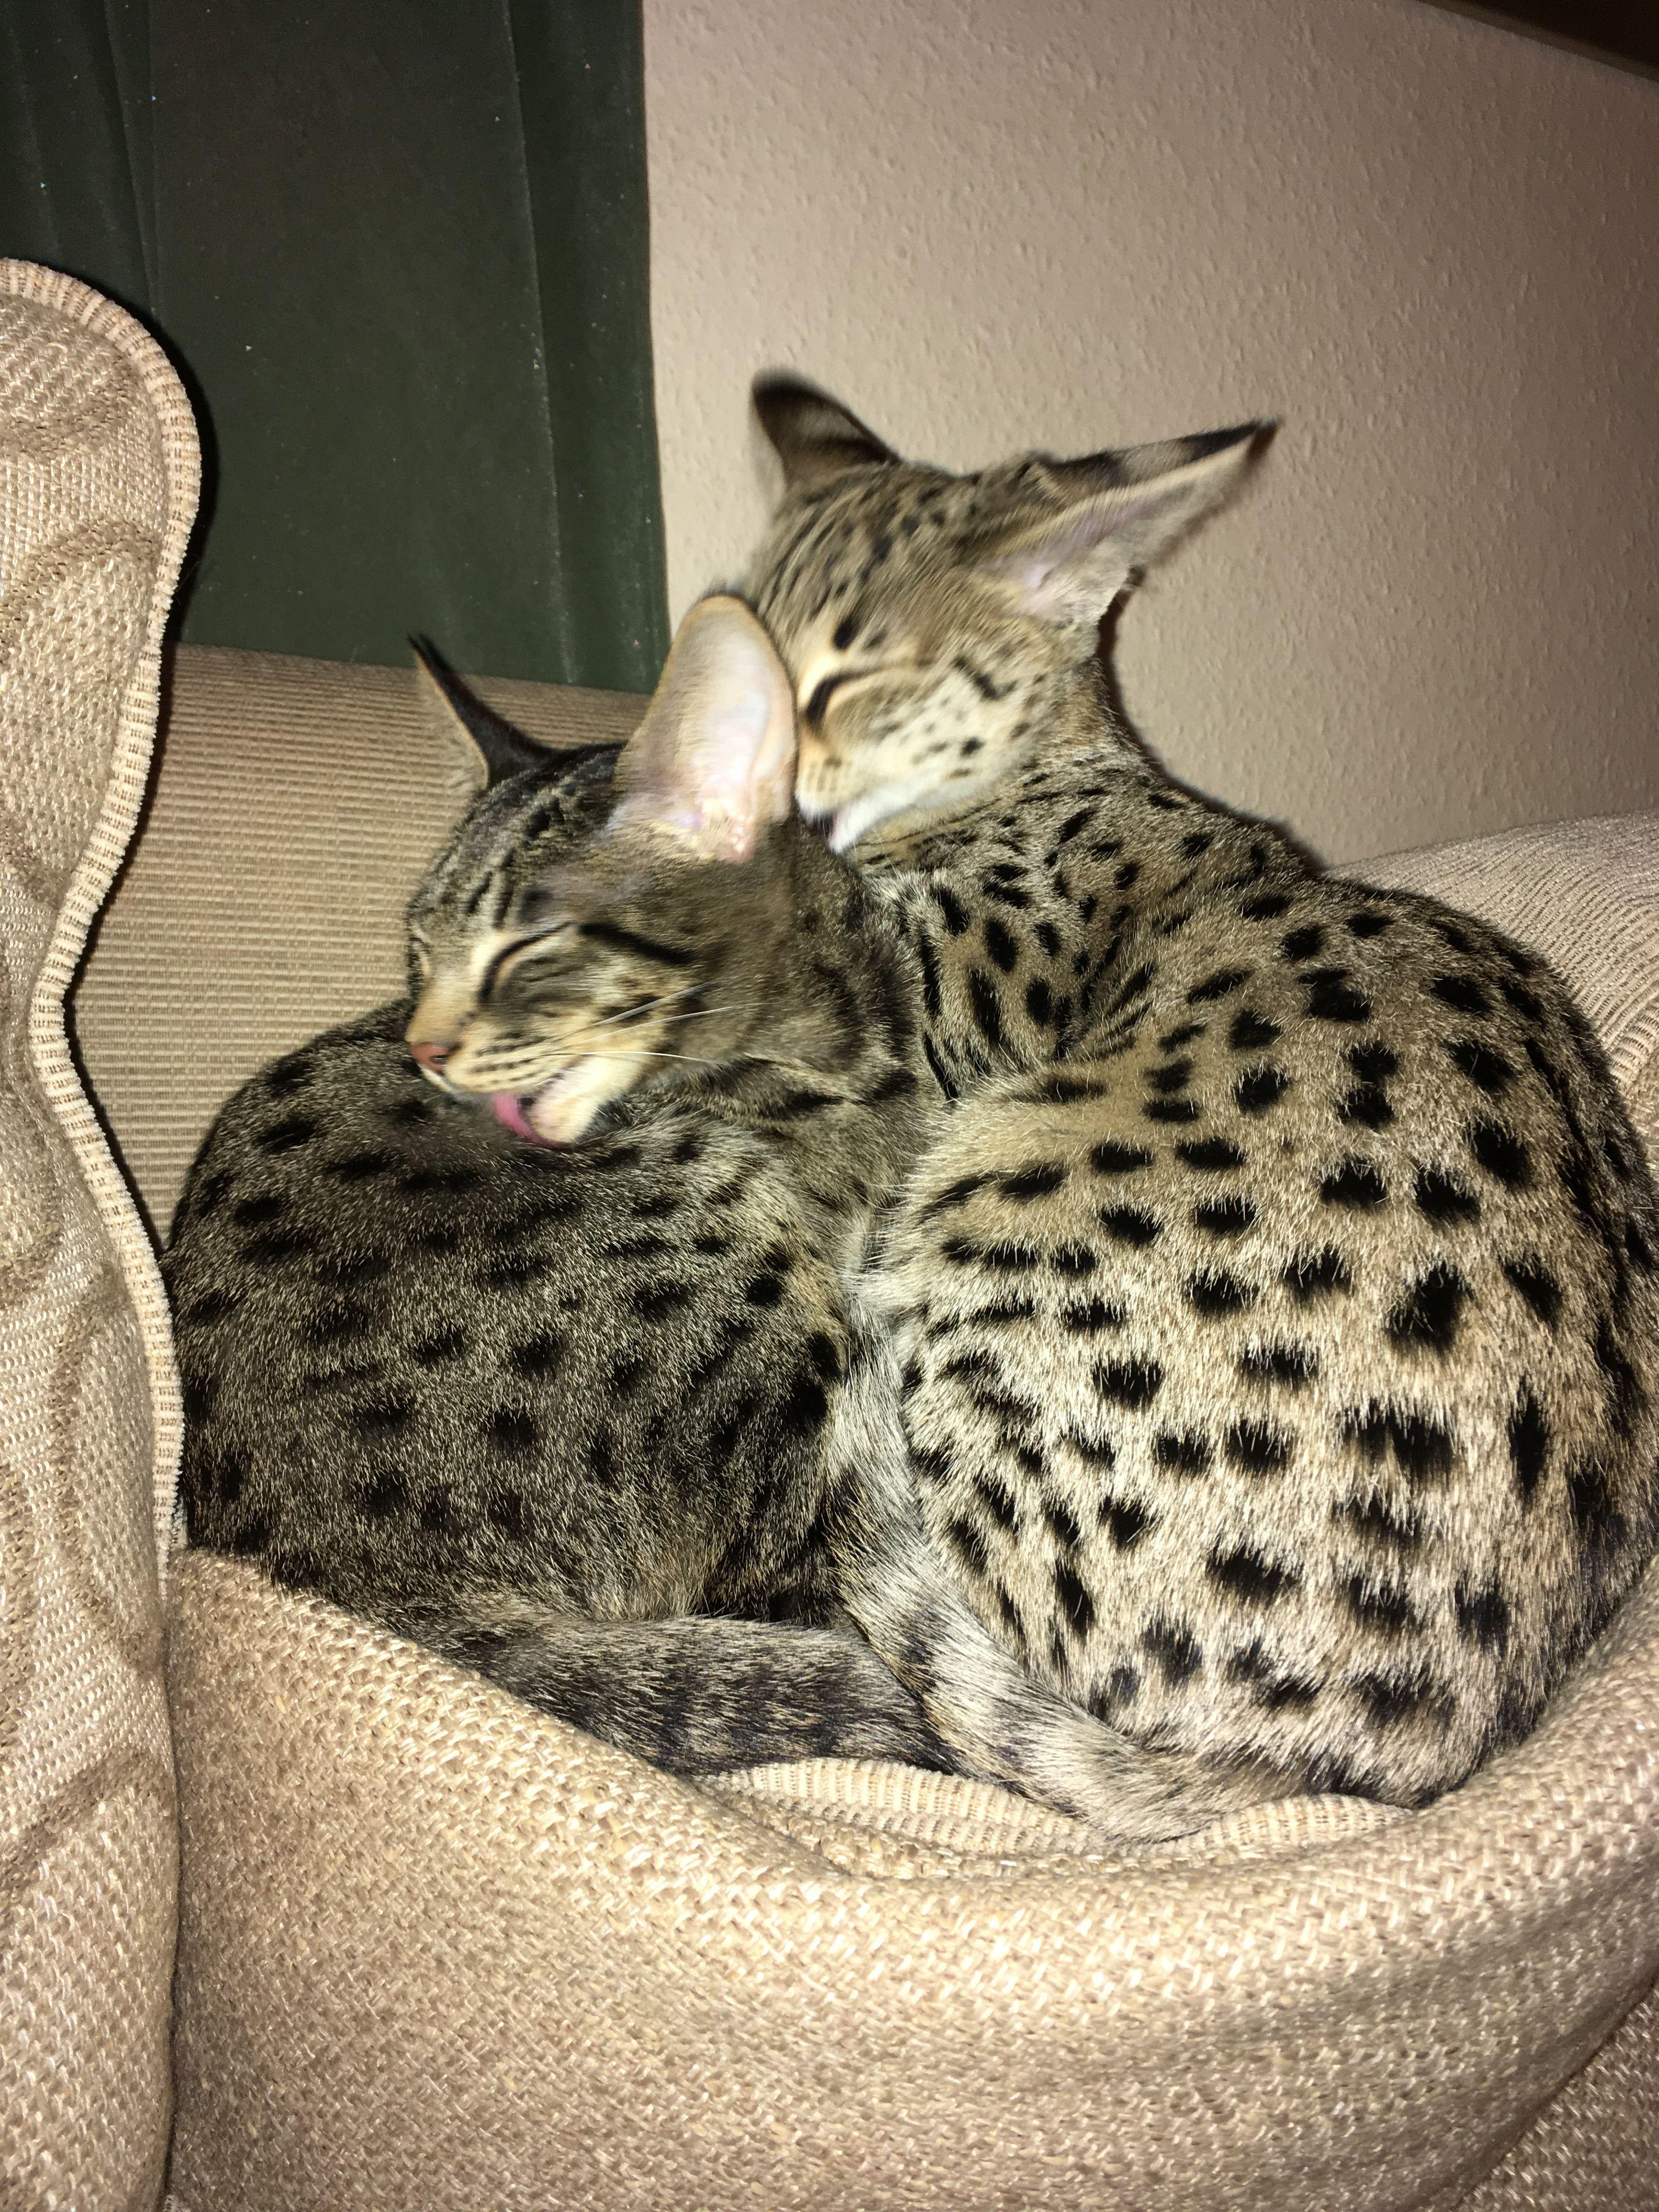 Savannah Kittens Cats F6 F1 Savannah Kitten Savannah Cat Cats